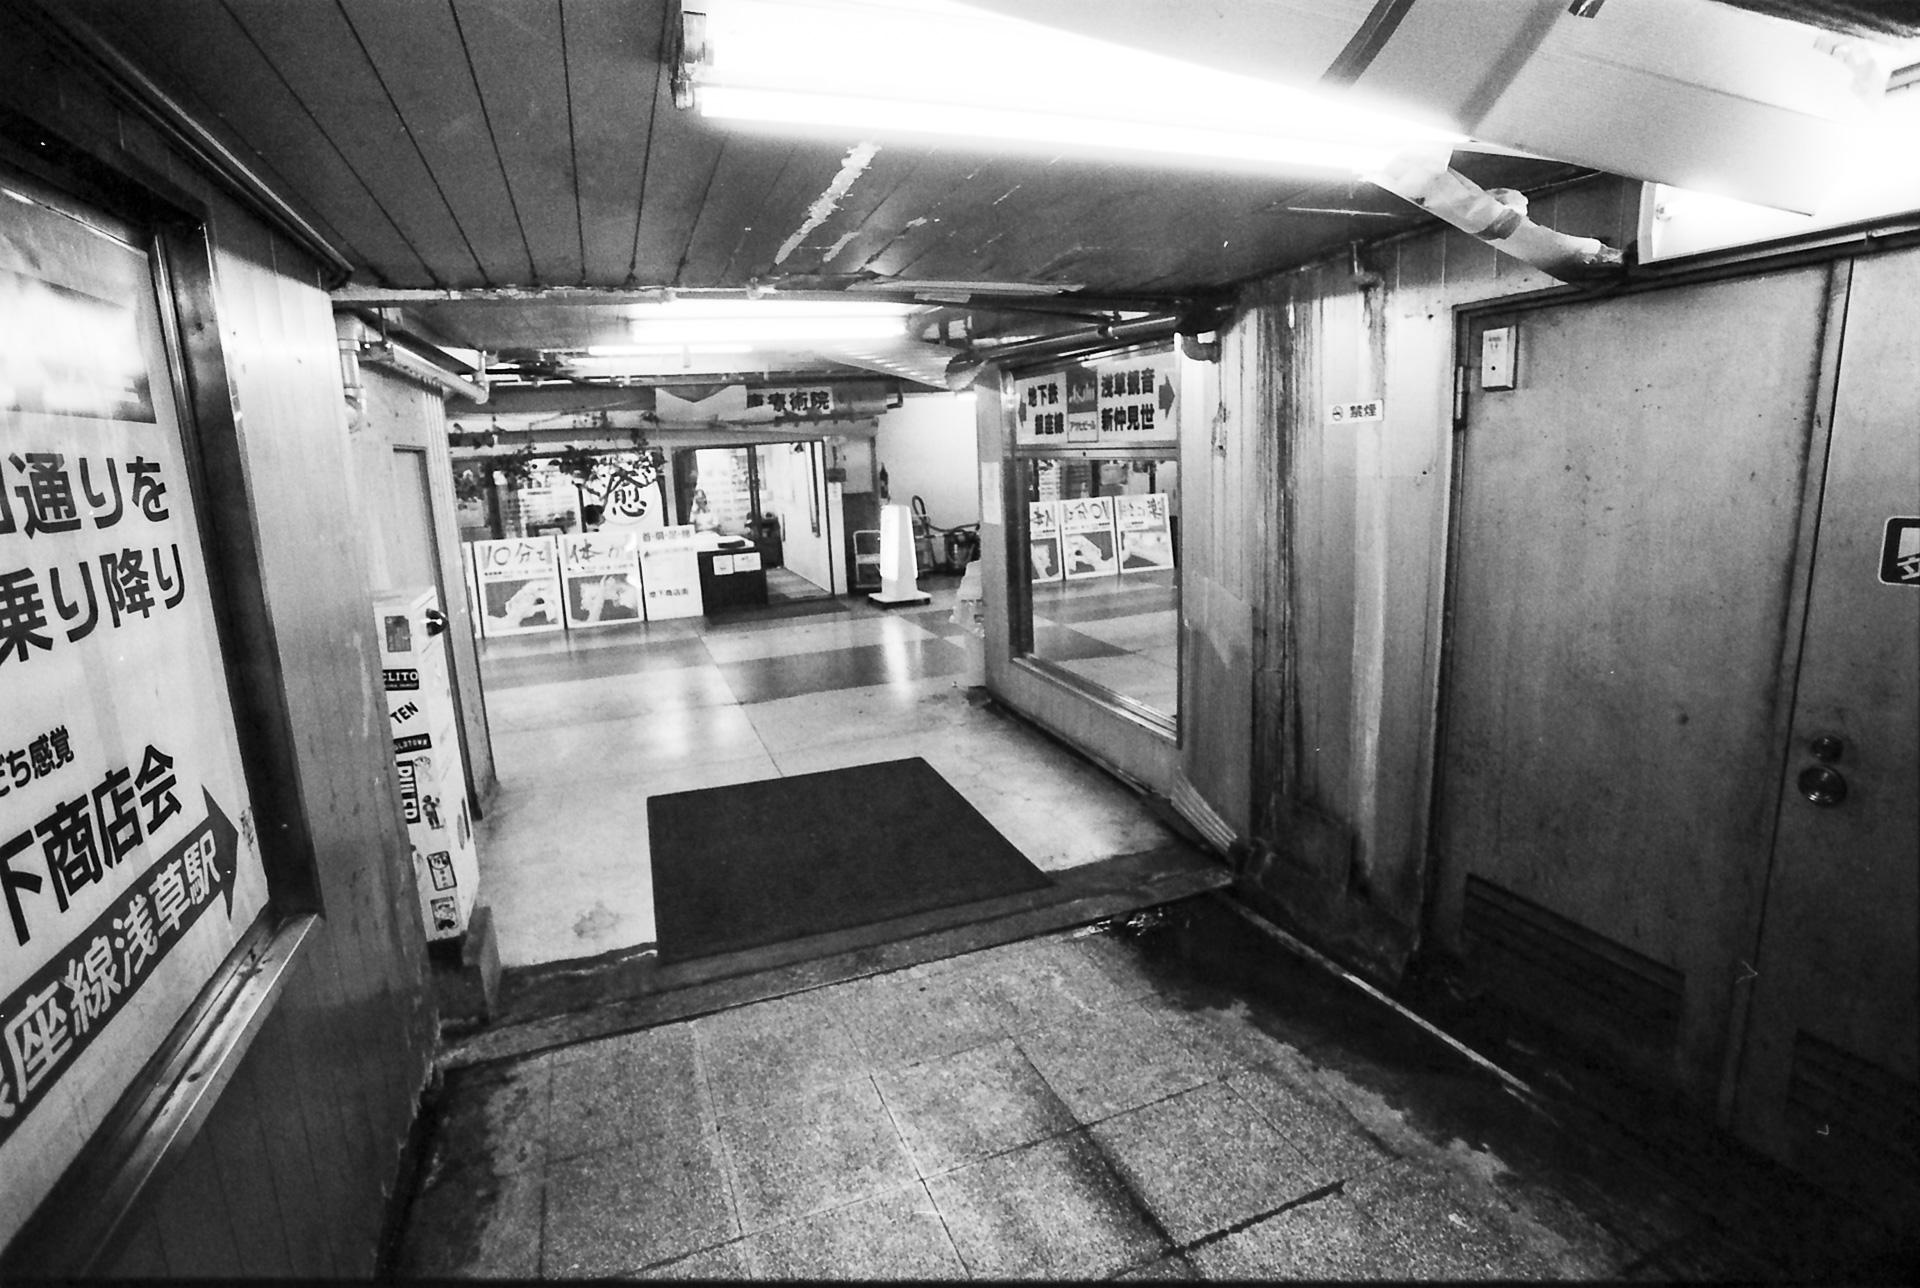 浅草地下街 出入り口 Canon EOS-1, EF 17-40mm F4L USM, Rollei RPX 400